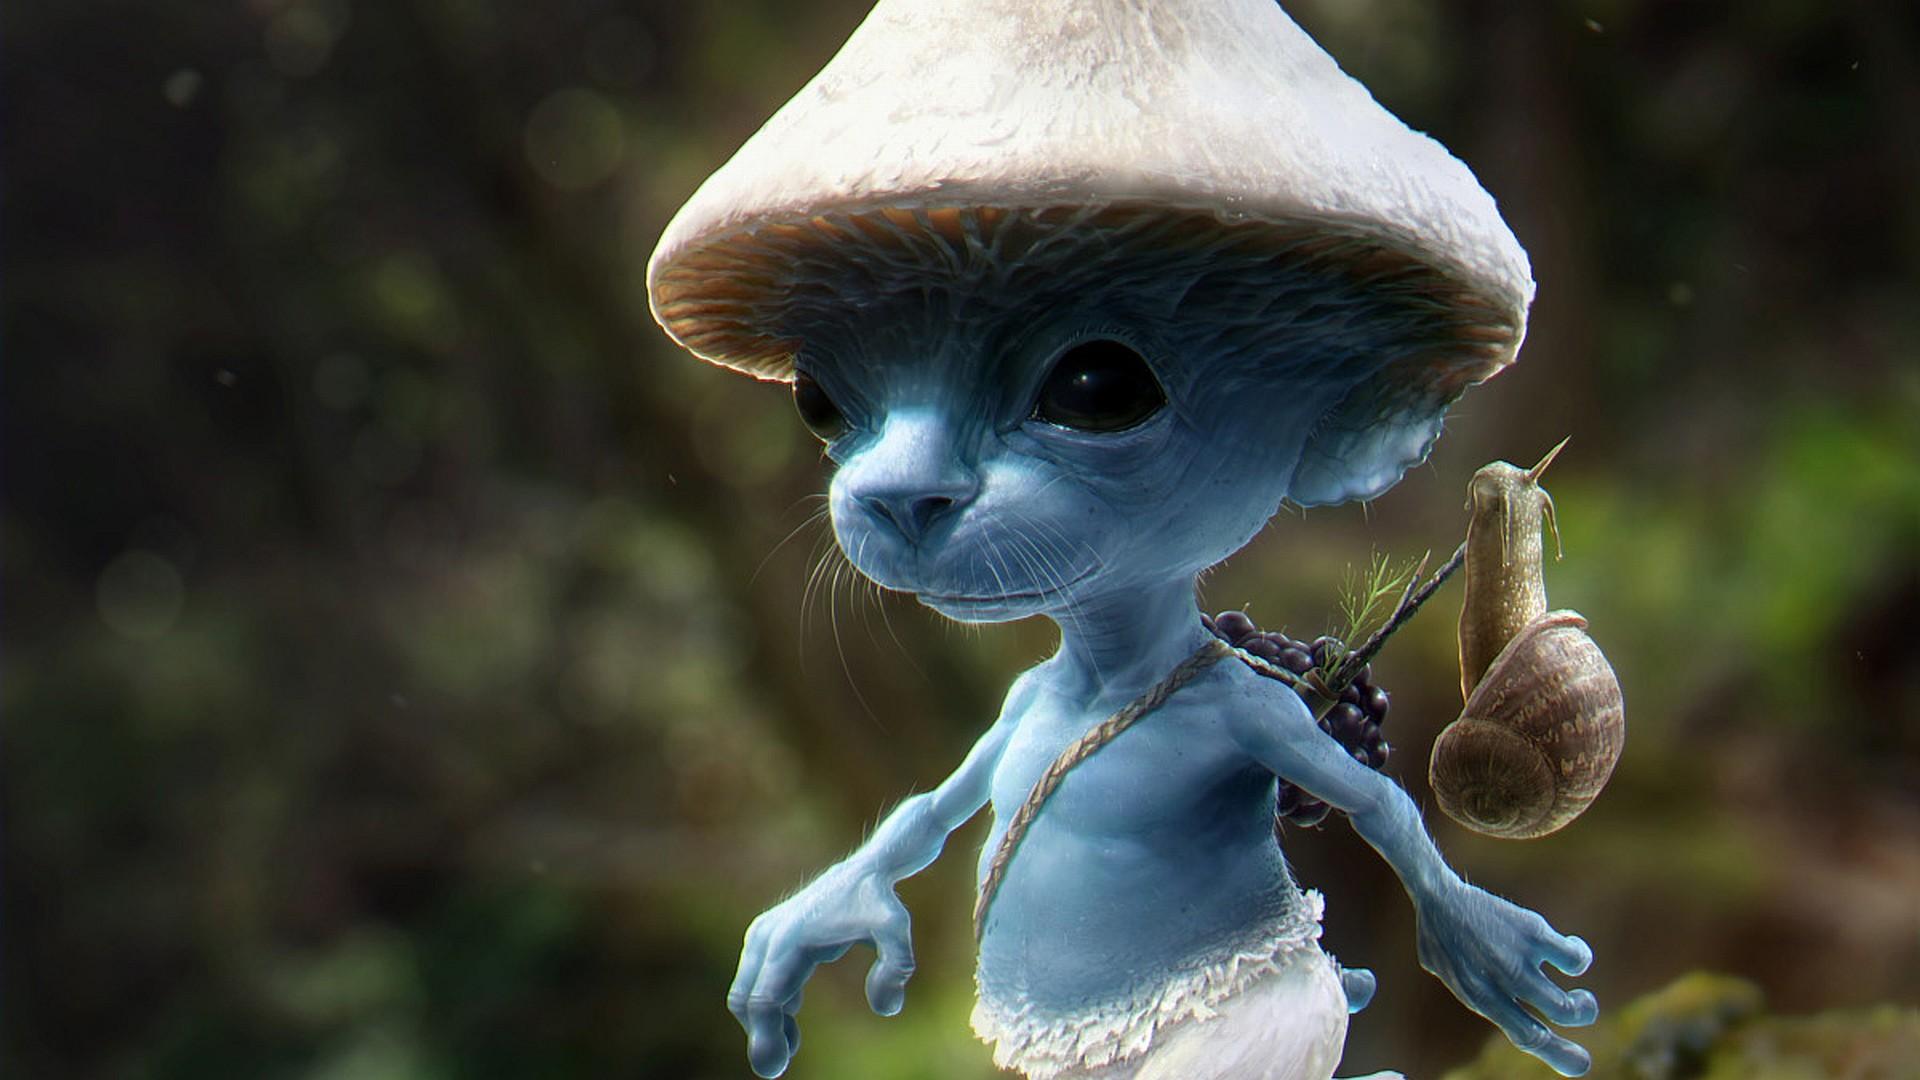 Fantasy Art Creatures The Smurfs